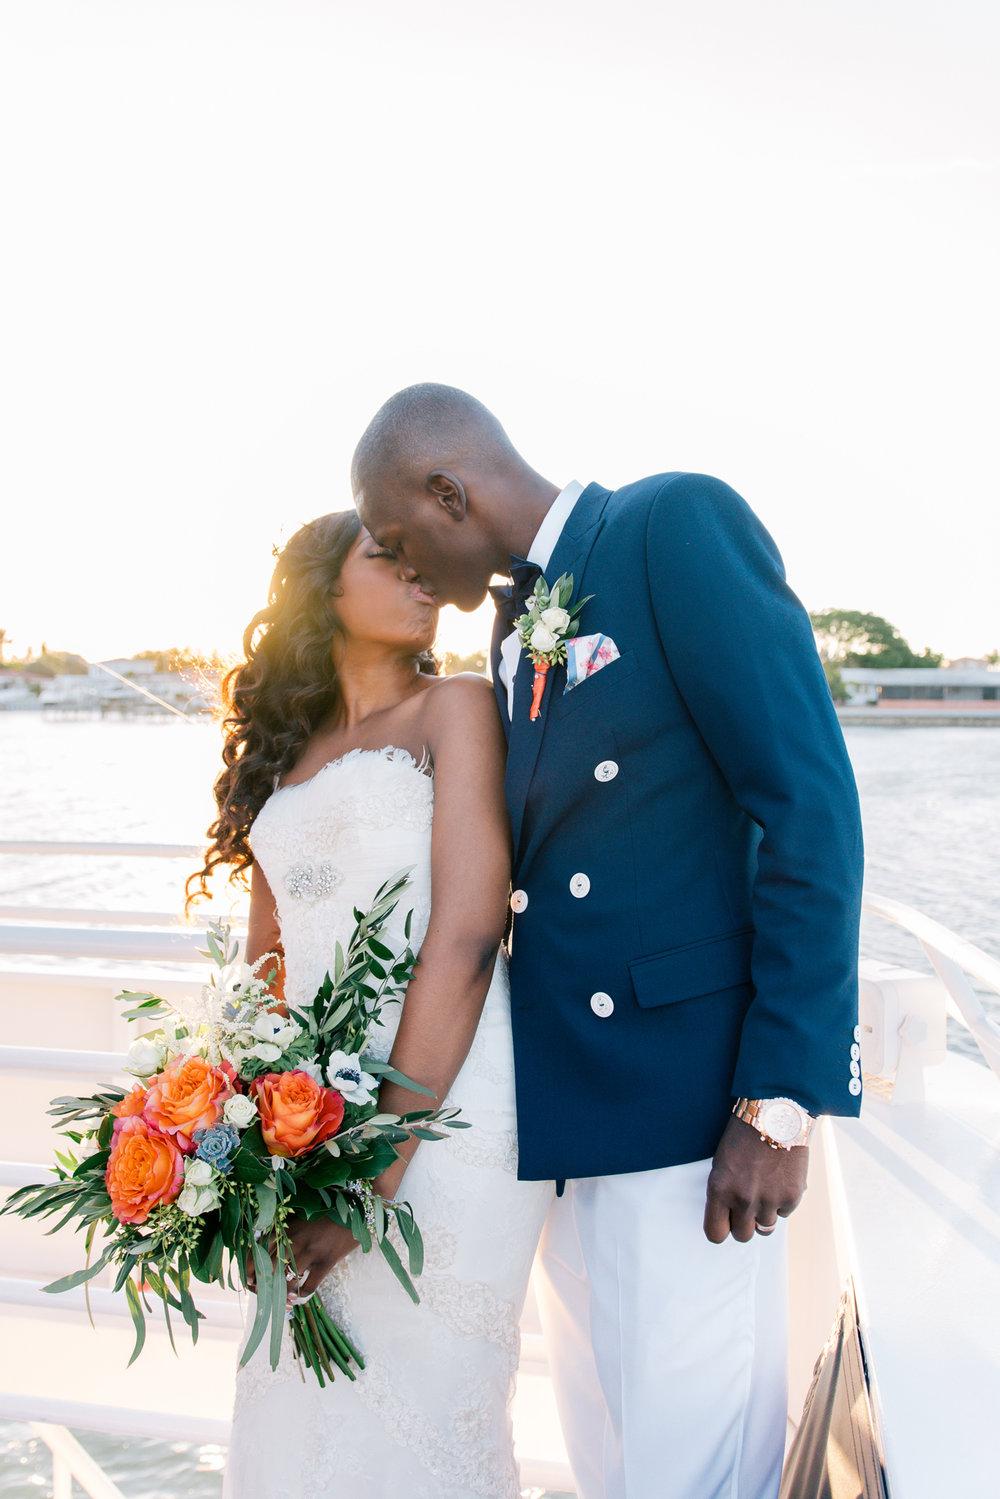 Starlite-wedding, Just-married-photo